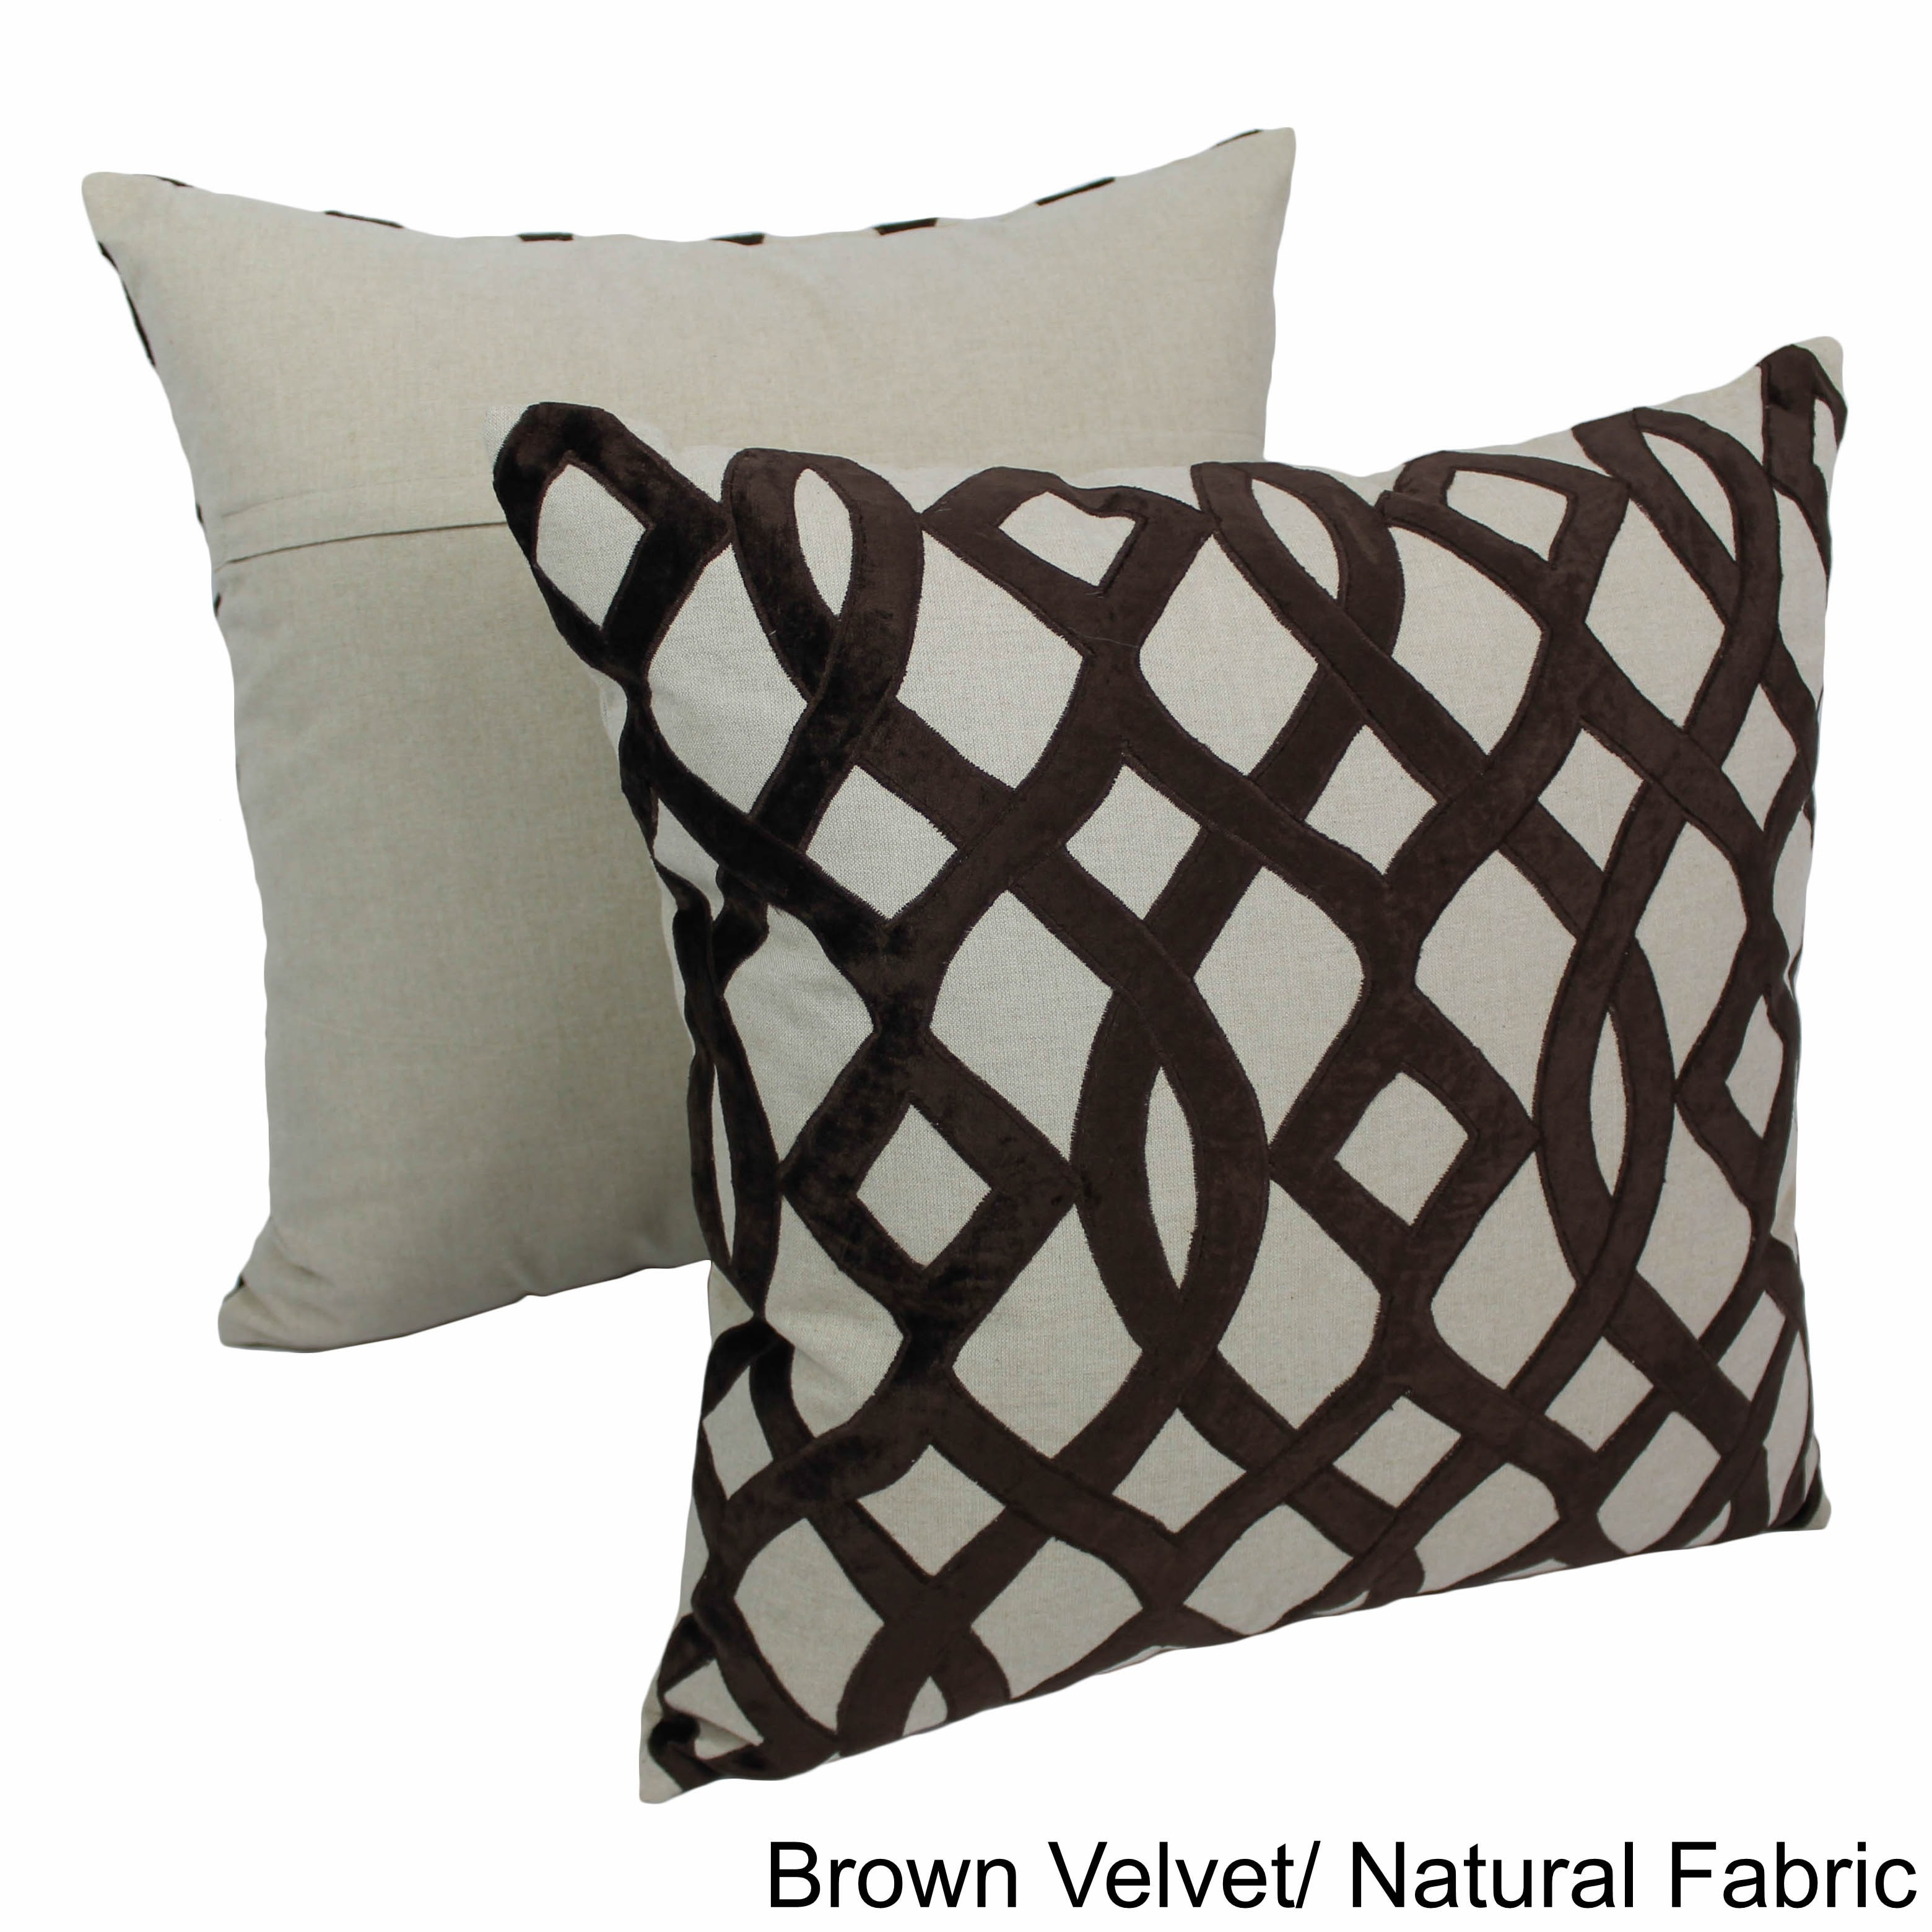 index pink pillows linen fleur osc decorative pillow catalog trellis lis may cape de yellow